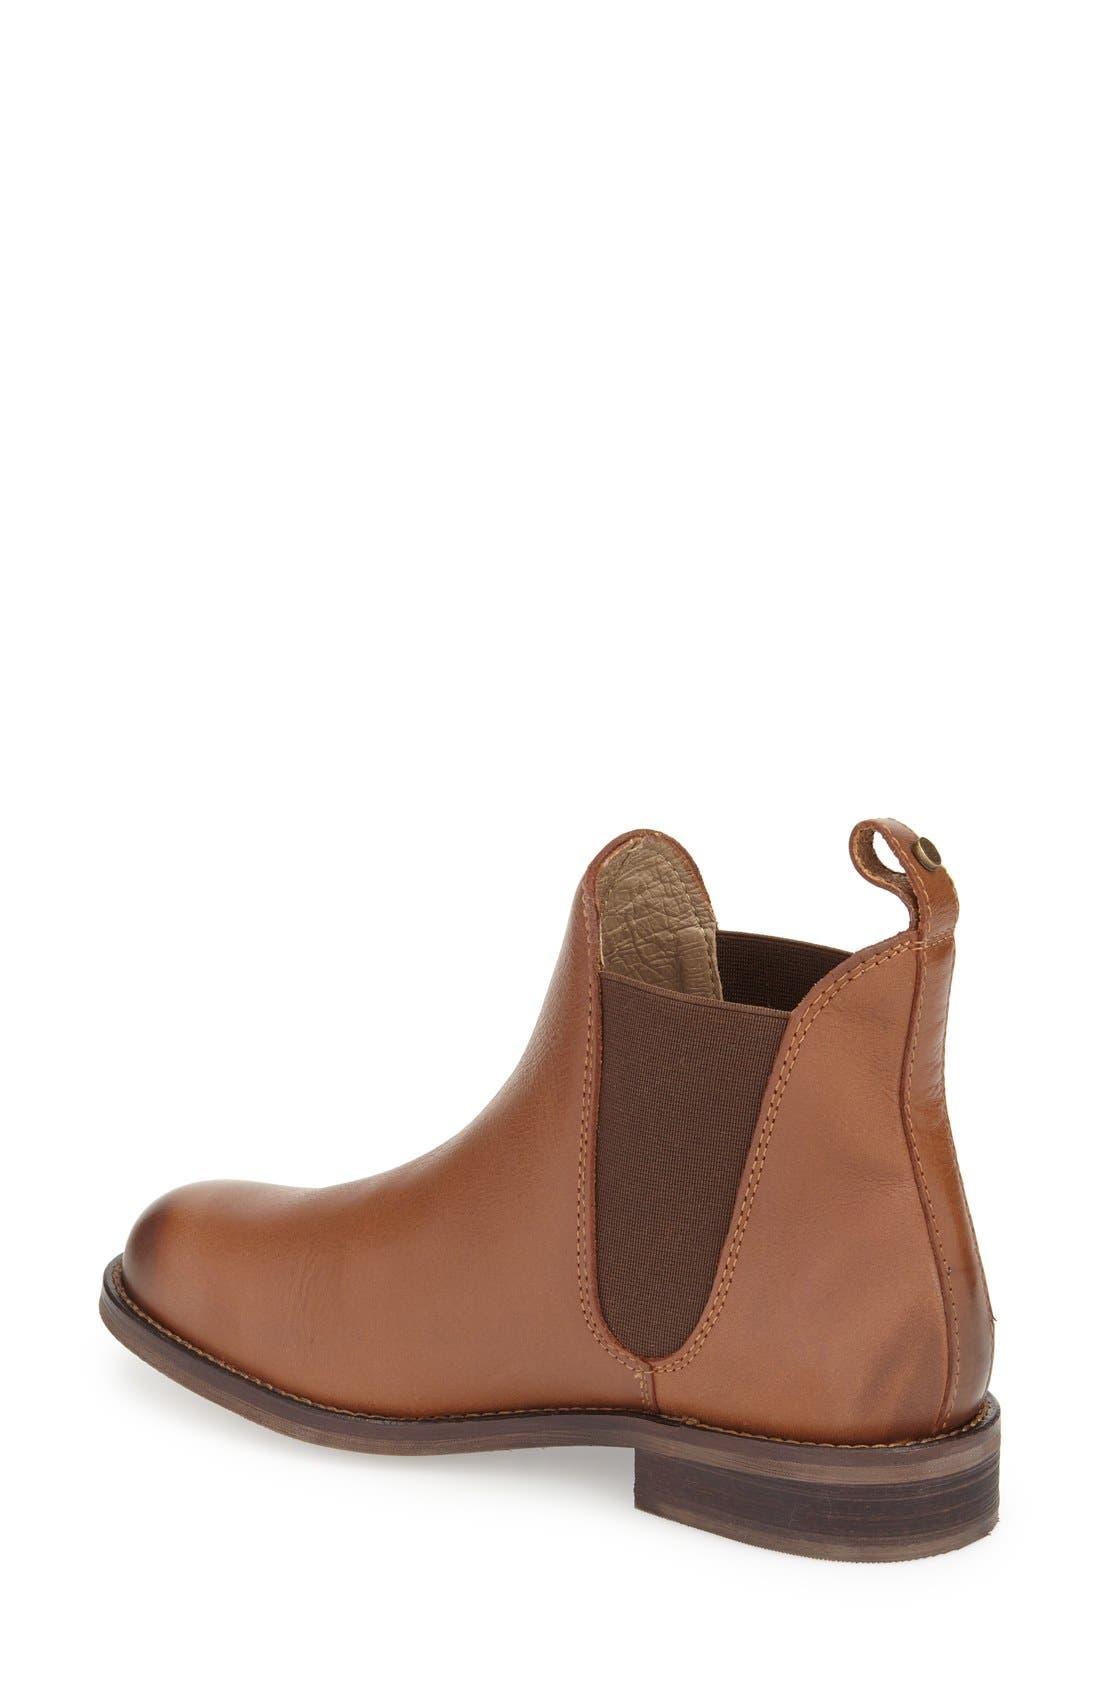 'Royce' Chelsea Boot,                             Alternate thumbnail 6, color,